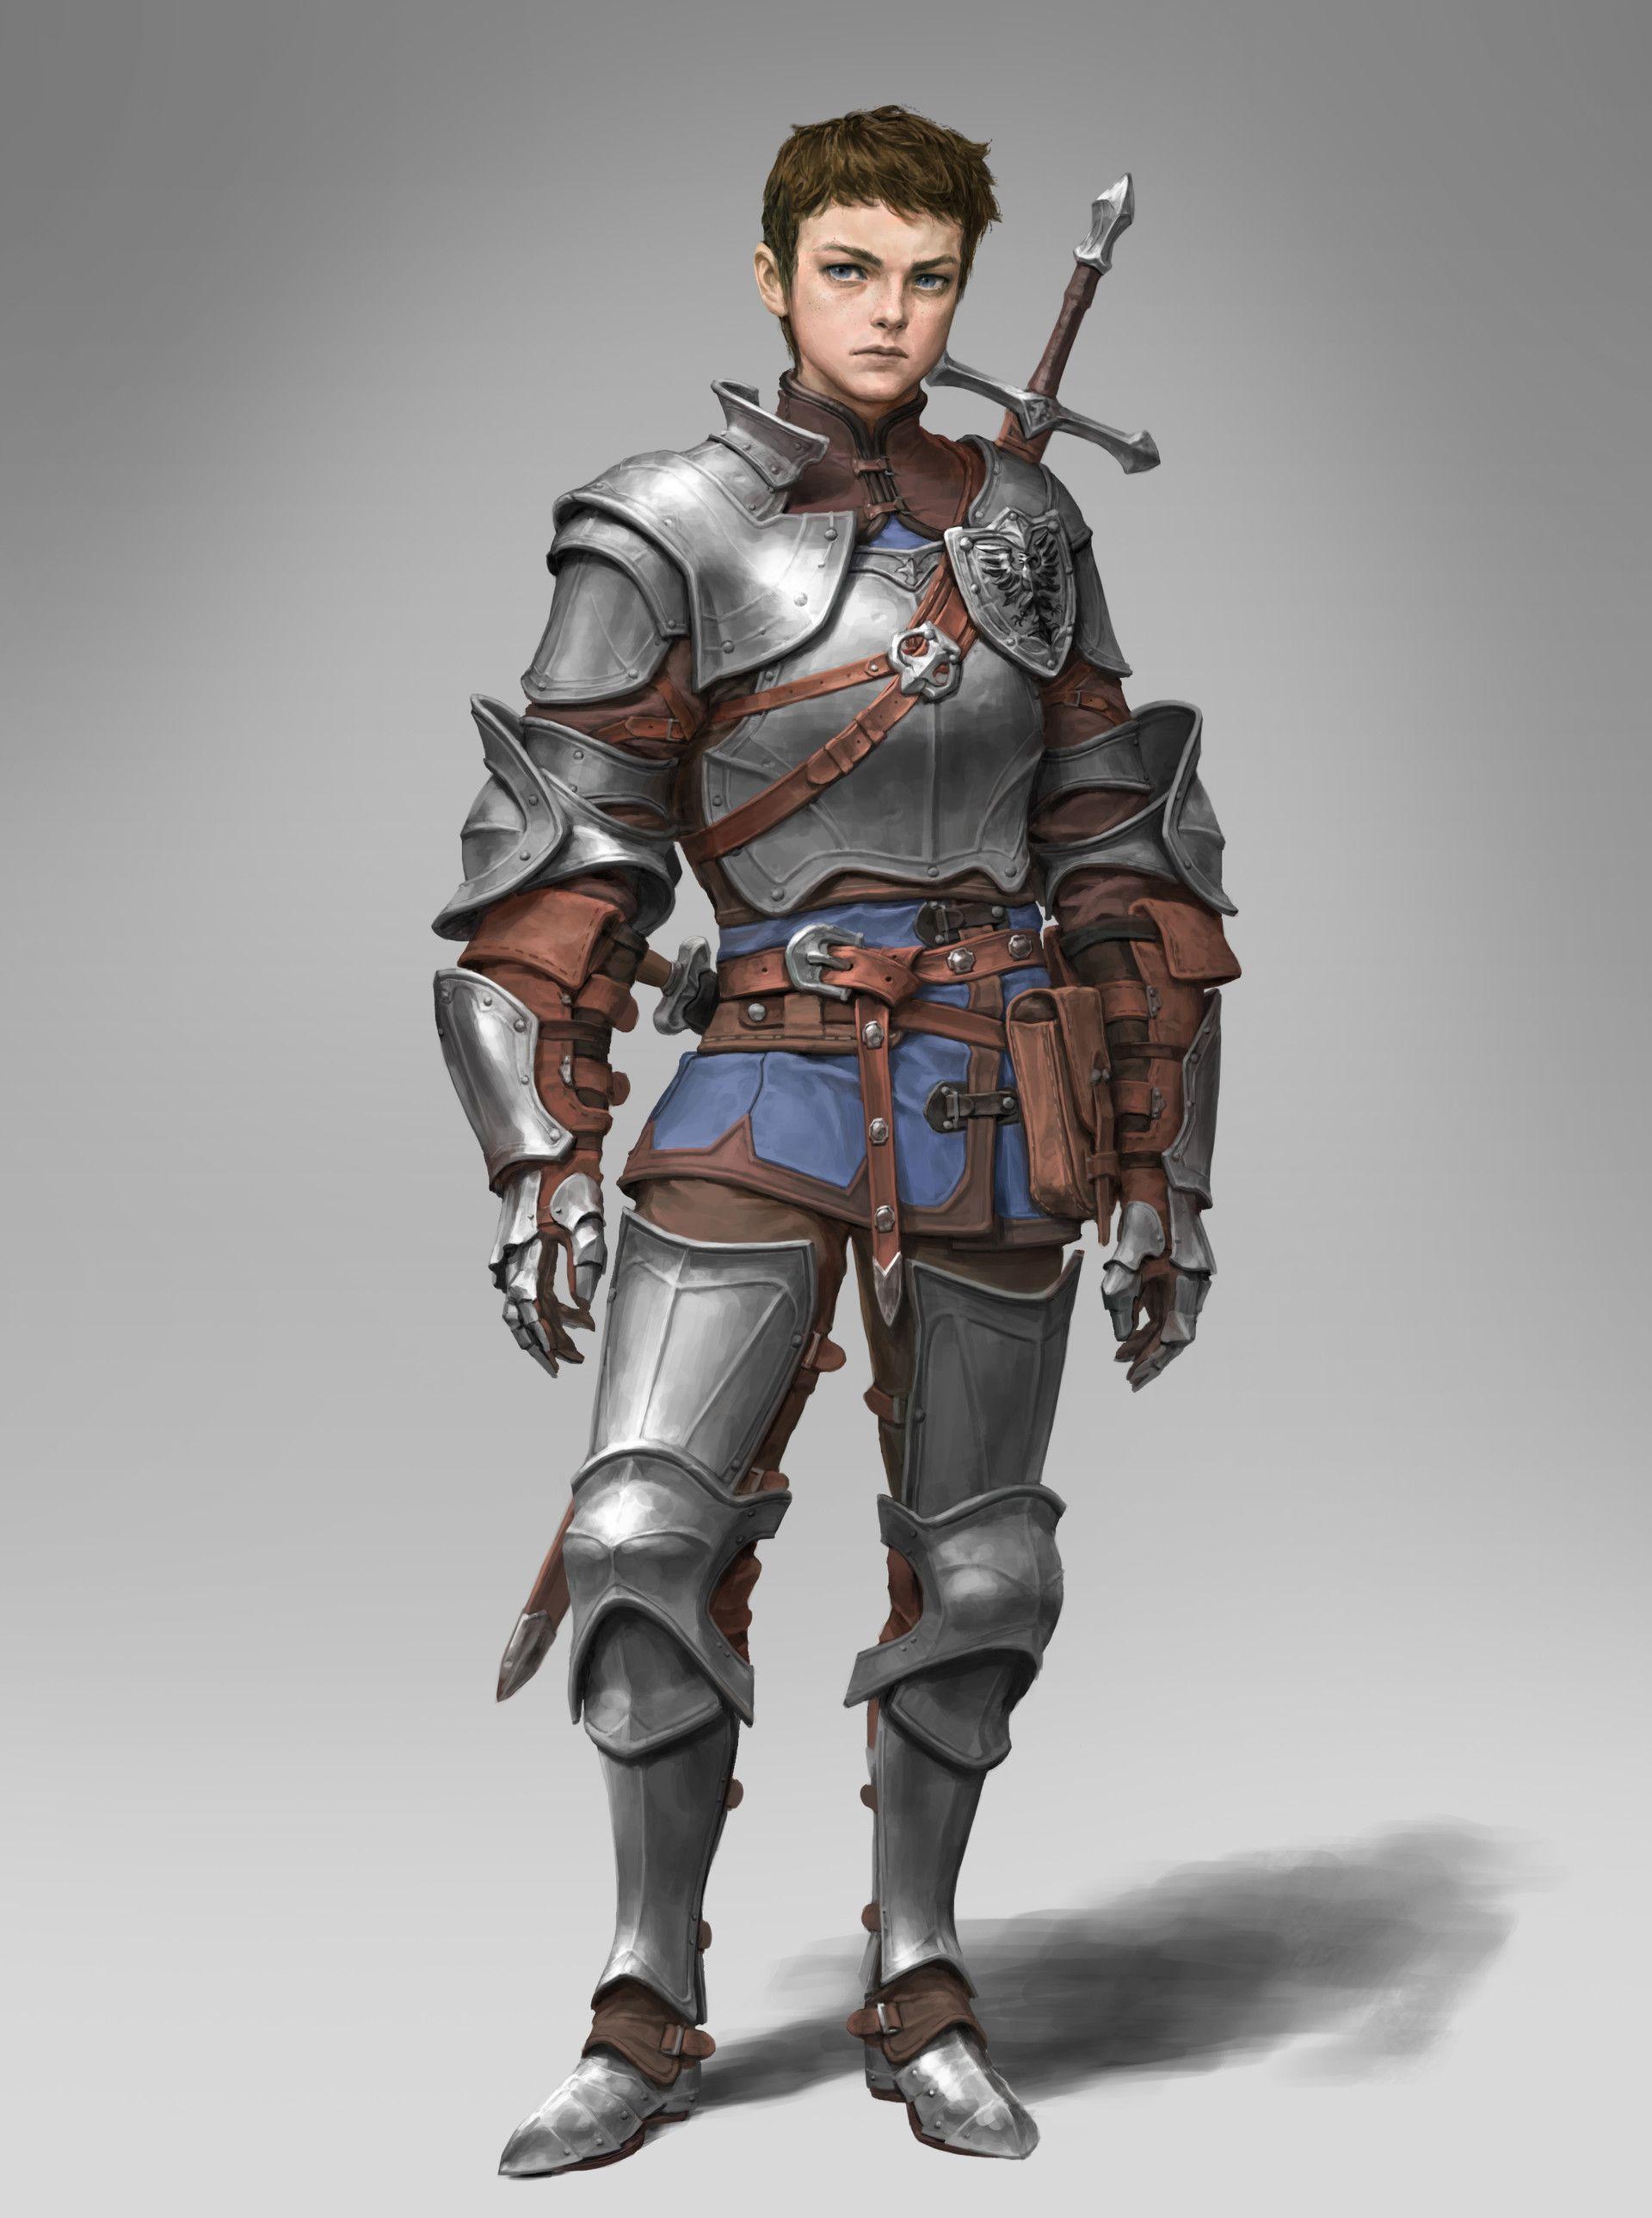 m Paladin Plate Armor 2 Handed Sword Dagger lwlvl traveler young knight, ArtStation hyunjoong ...